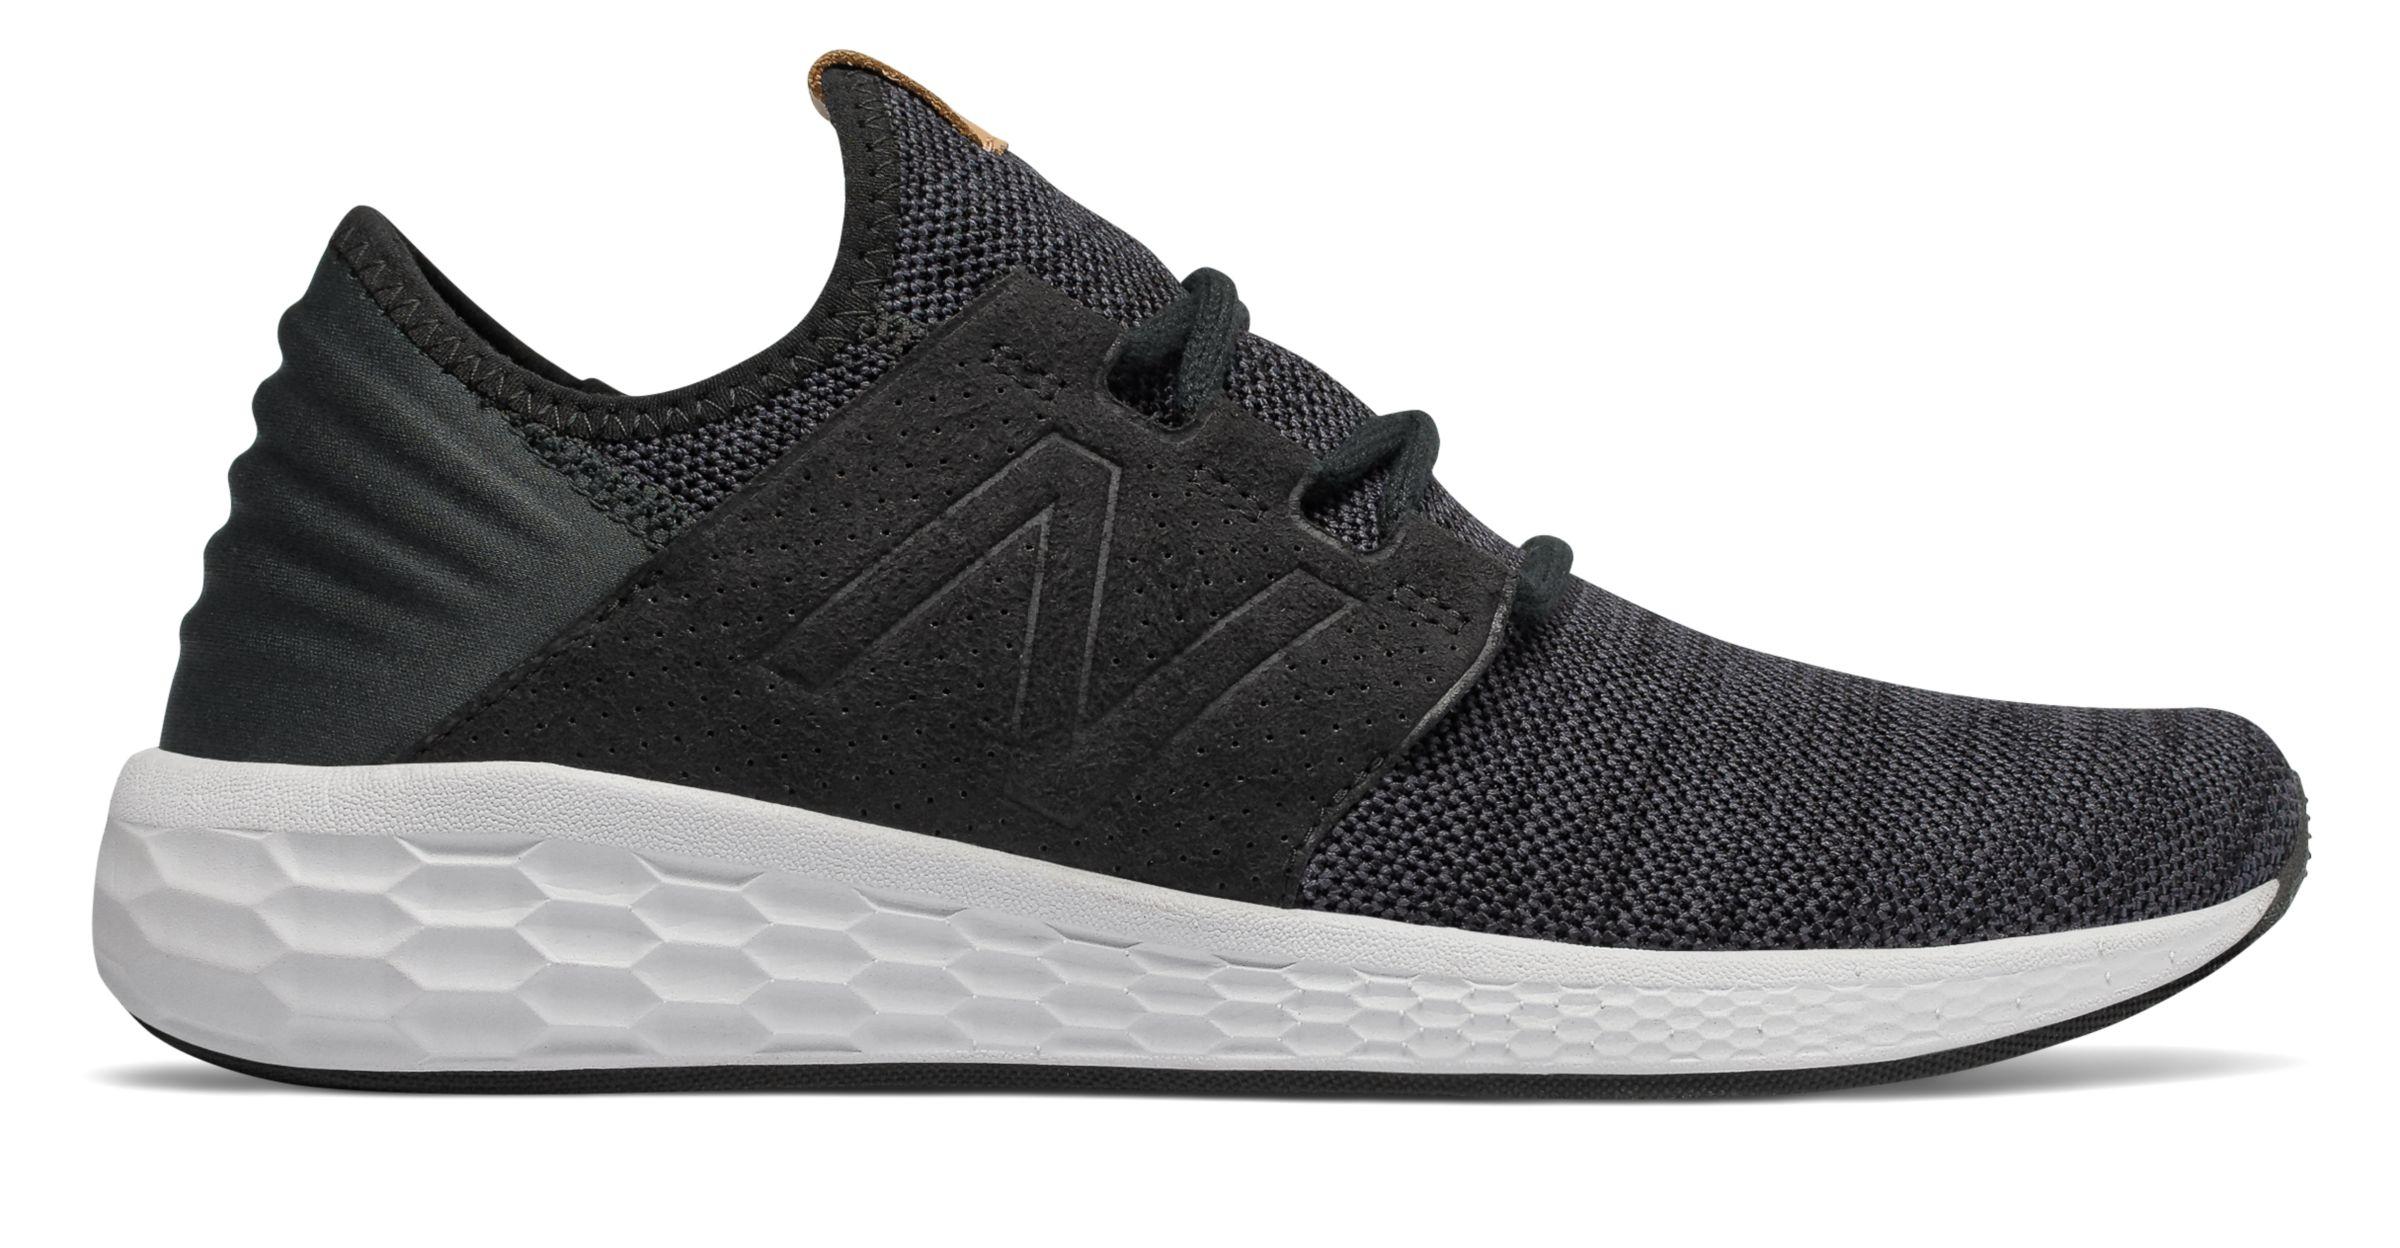 9386a6a933f76 New Balance Male Men's Fresh Foam Cruz V2 Knit Comfort Adult Black ...